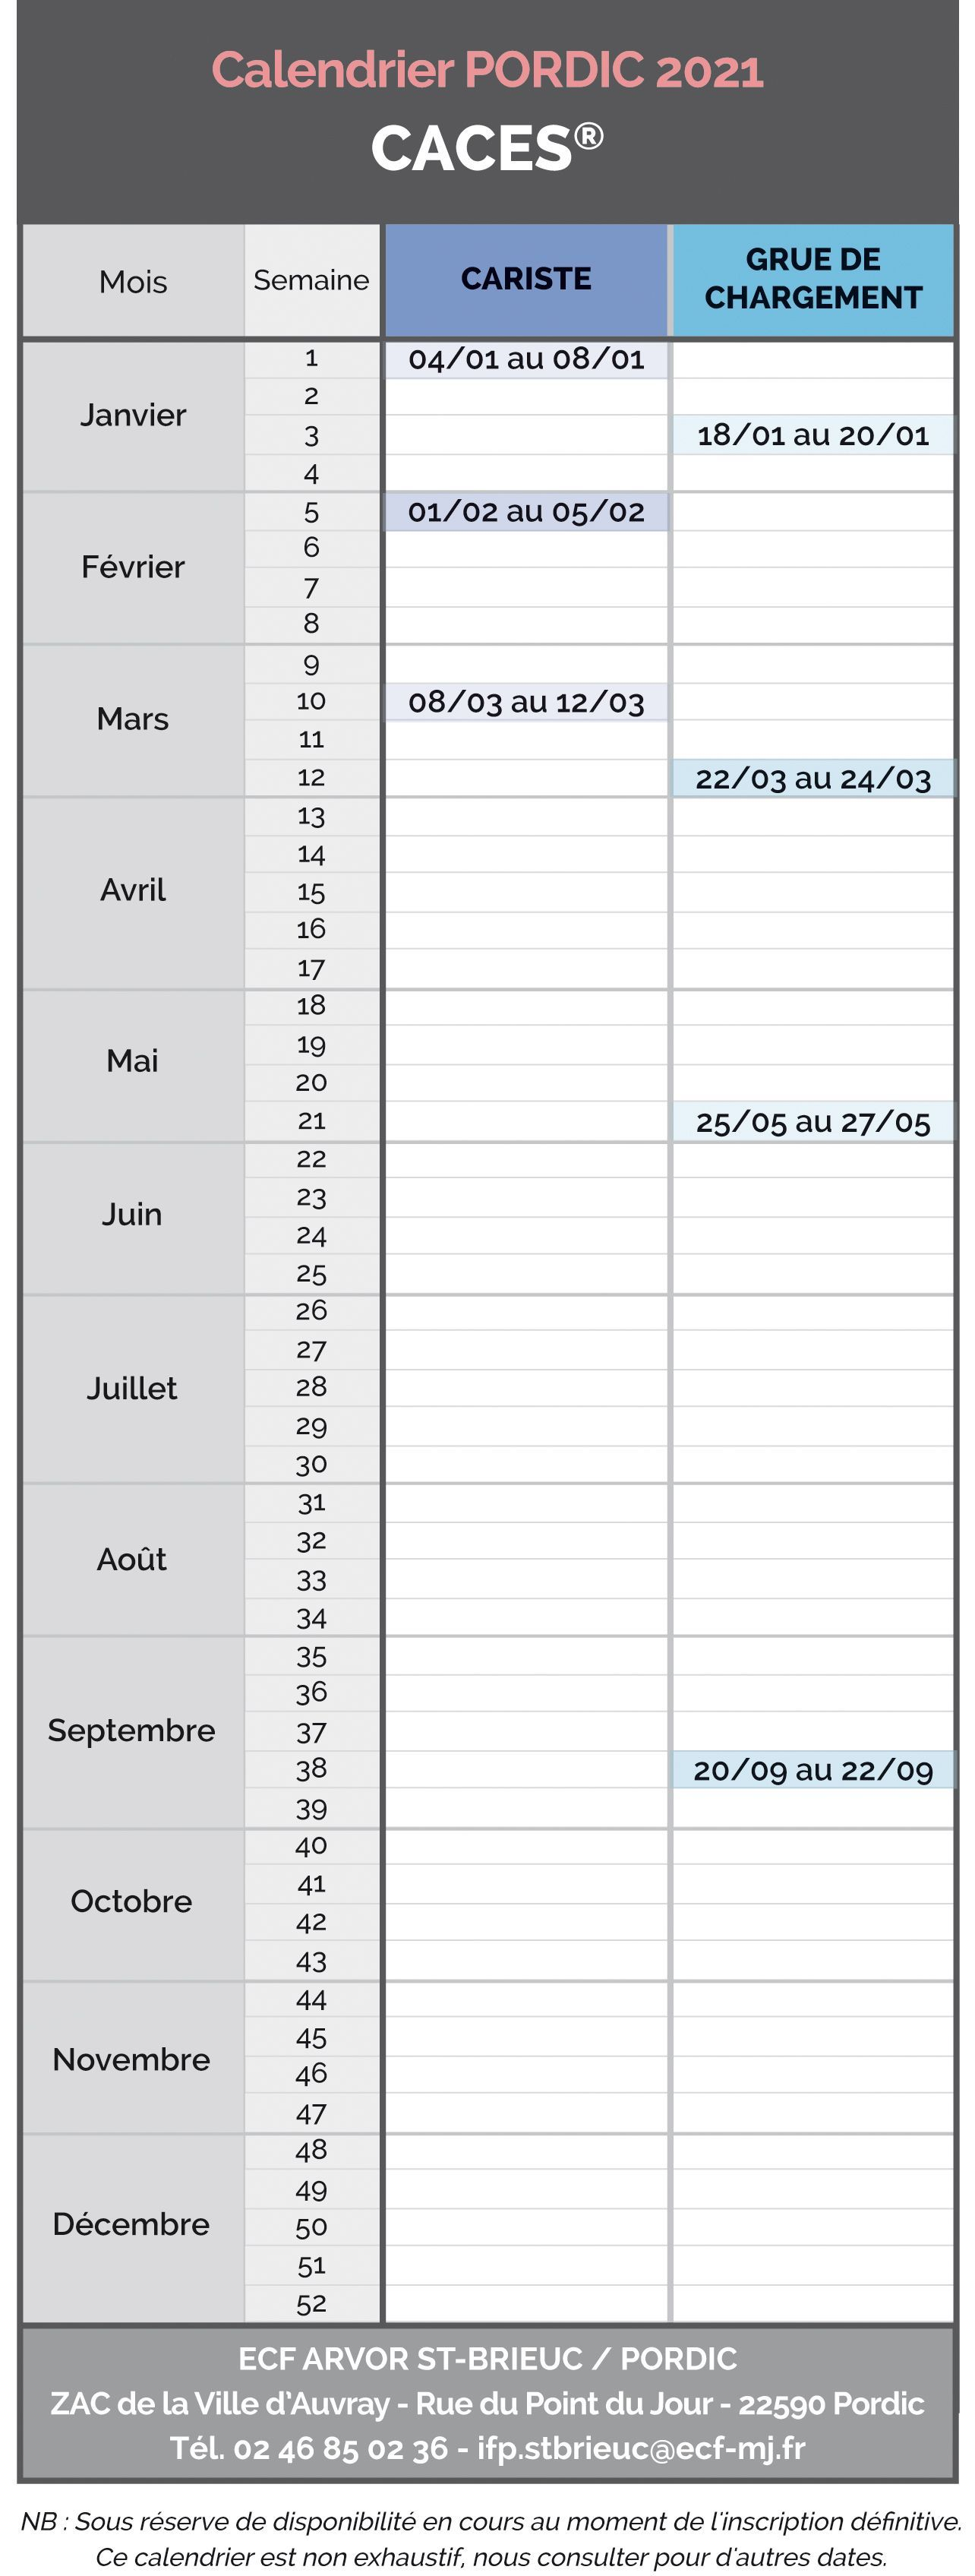 Calendrier 2021 Pordic - Caces